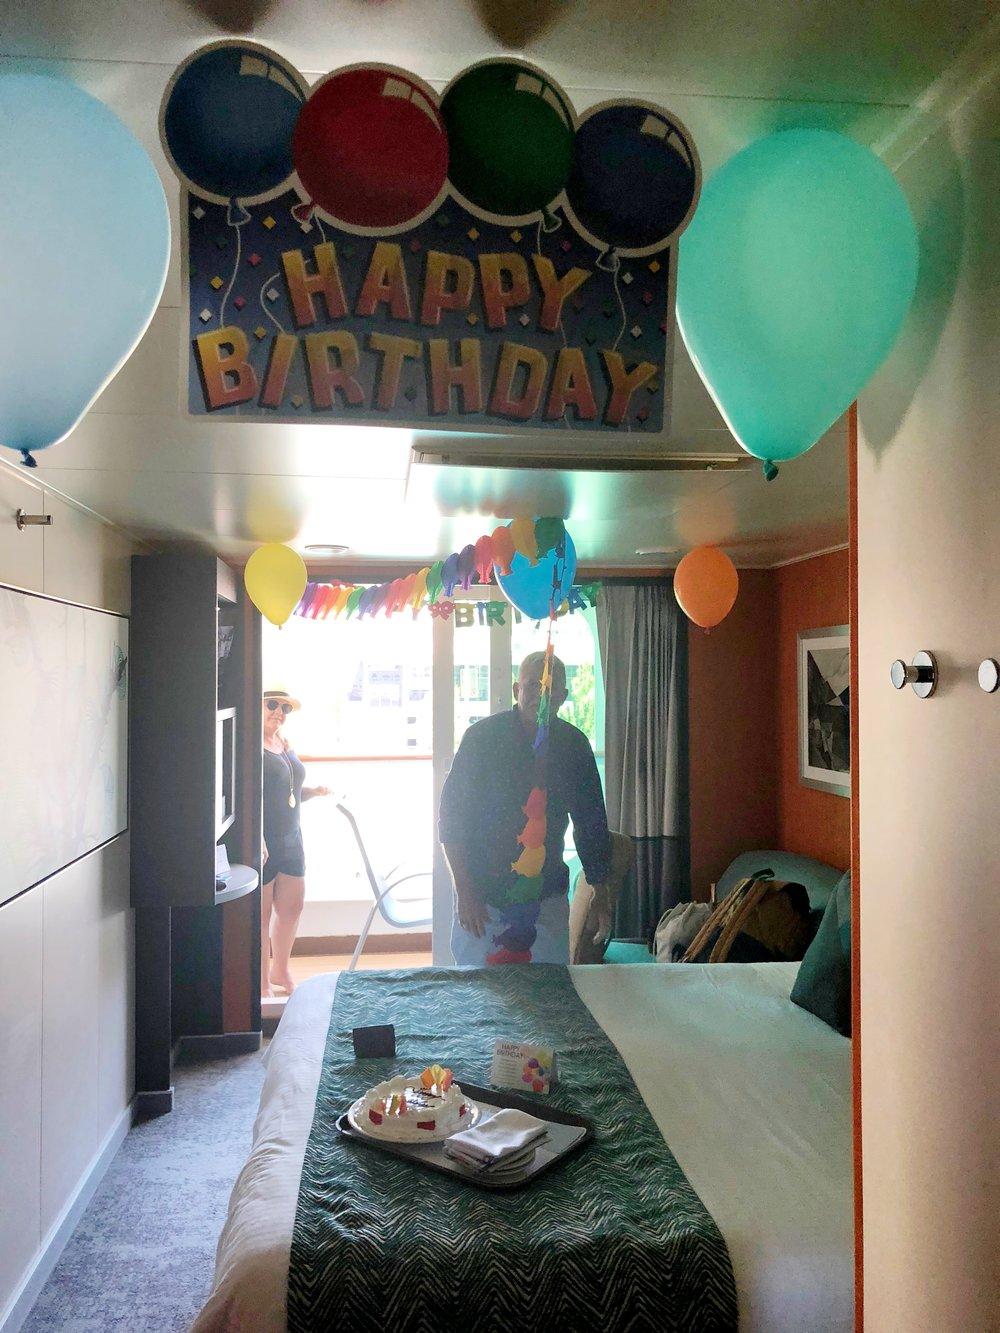 Birthday decorations! Thank you Norwegian!